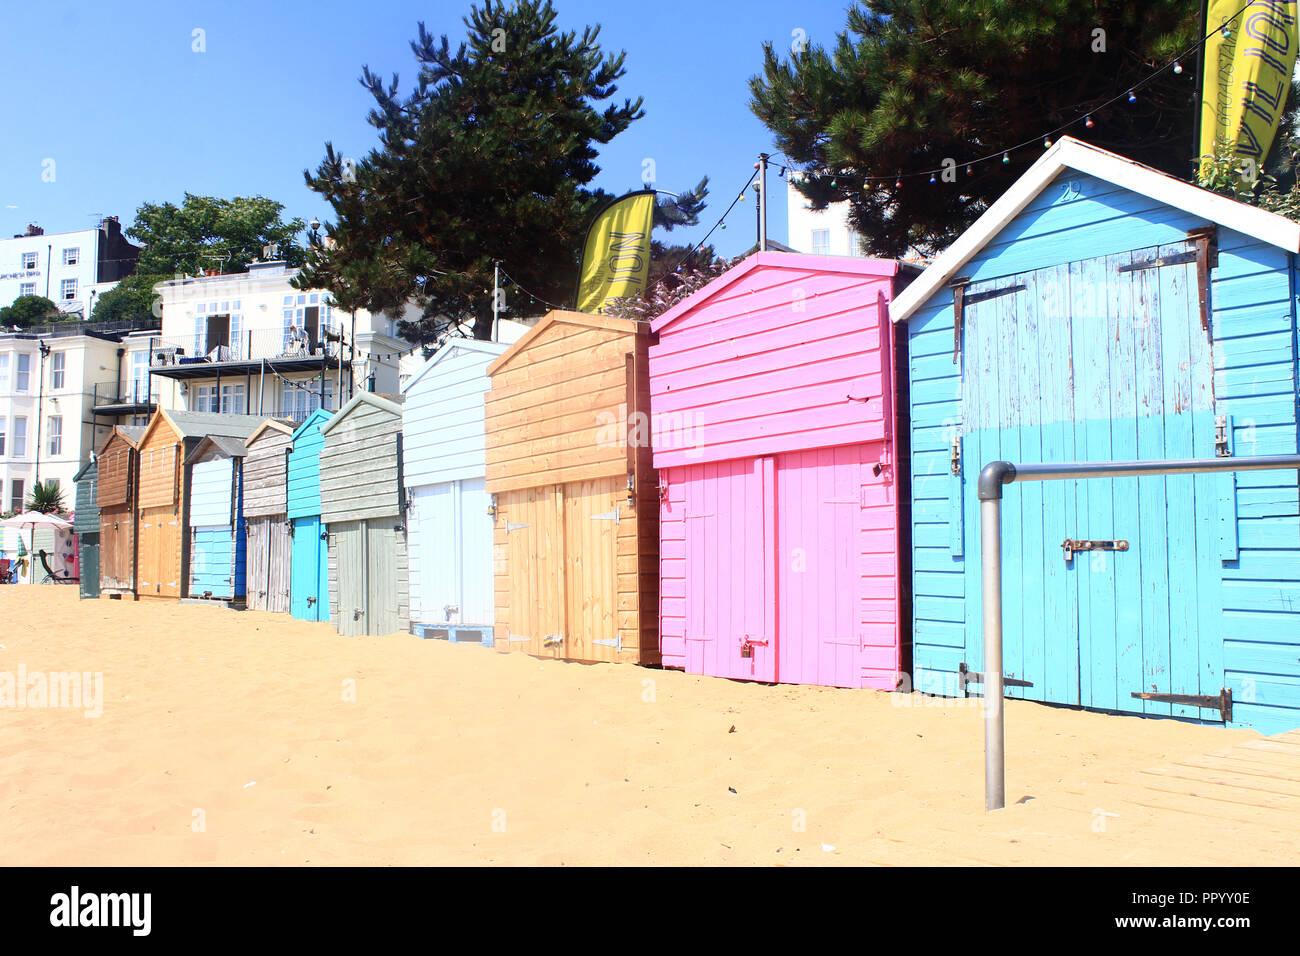 Beach huts at Viking Bay, Broadstairs in UK - Stock Image